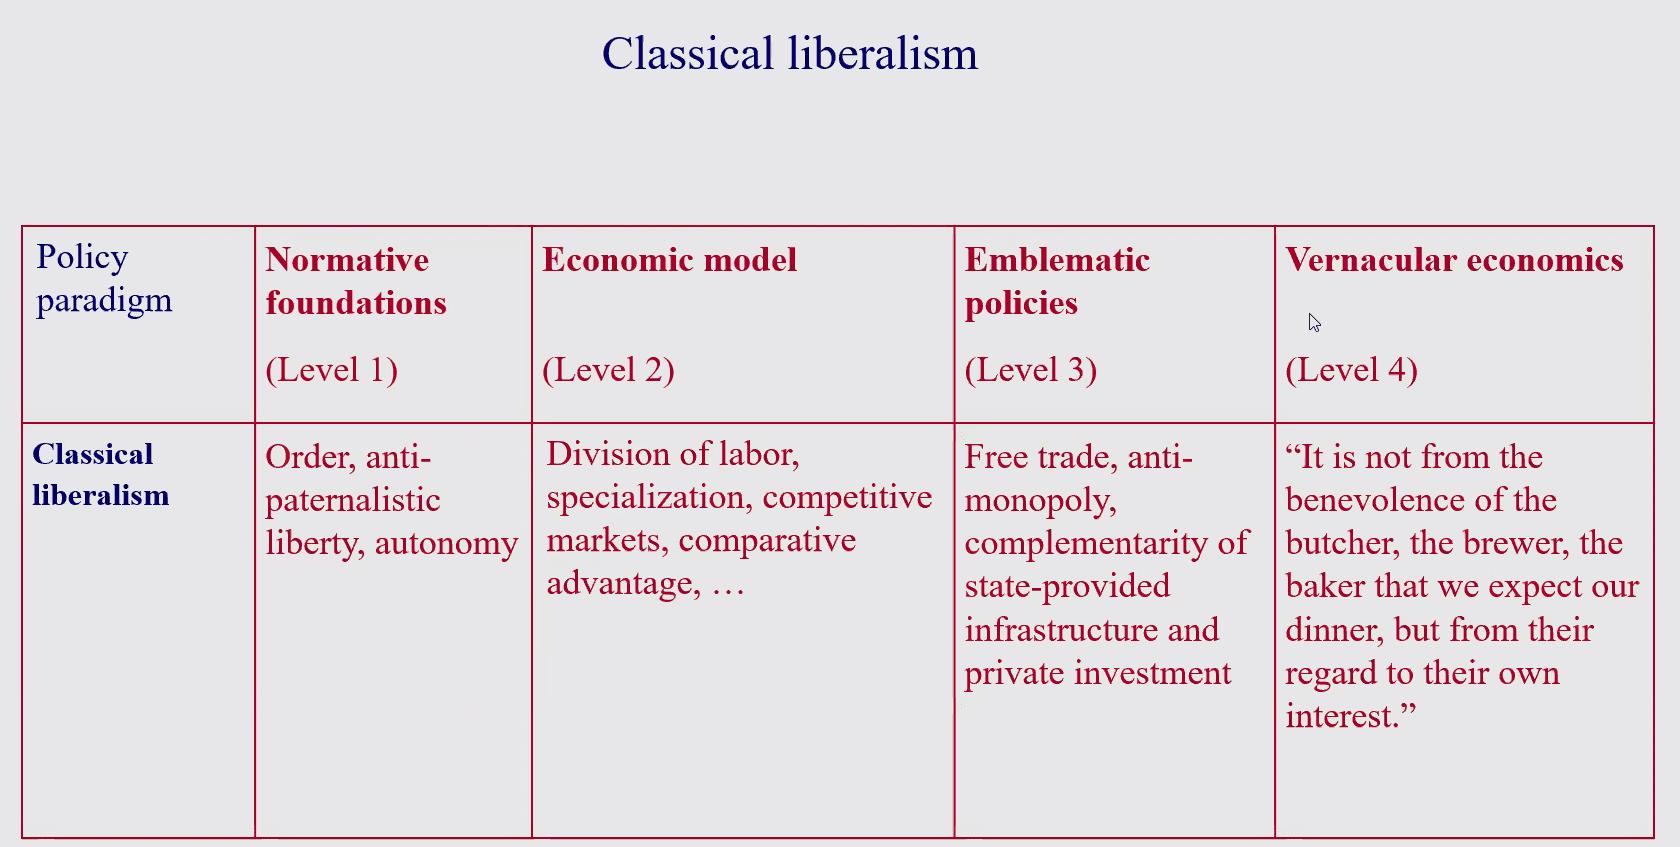 01 Classical liberalism